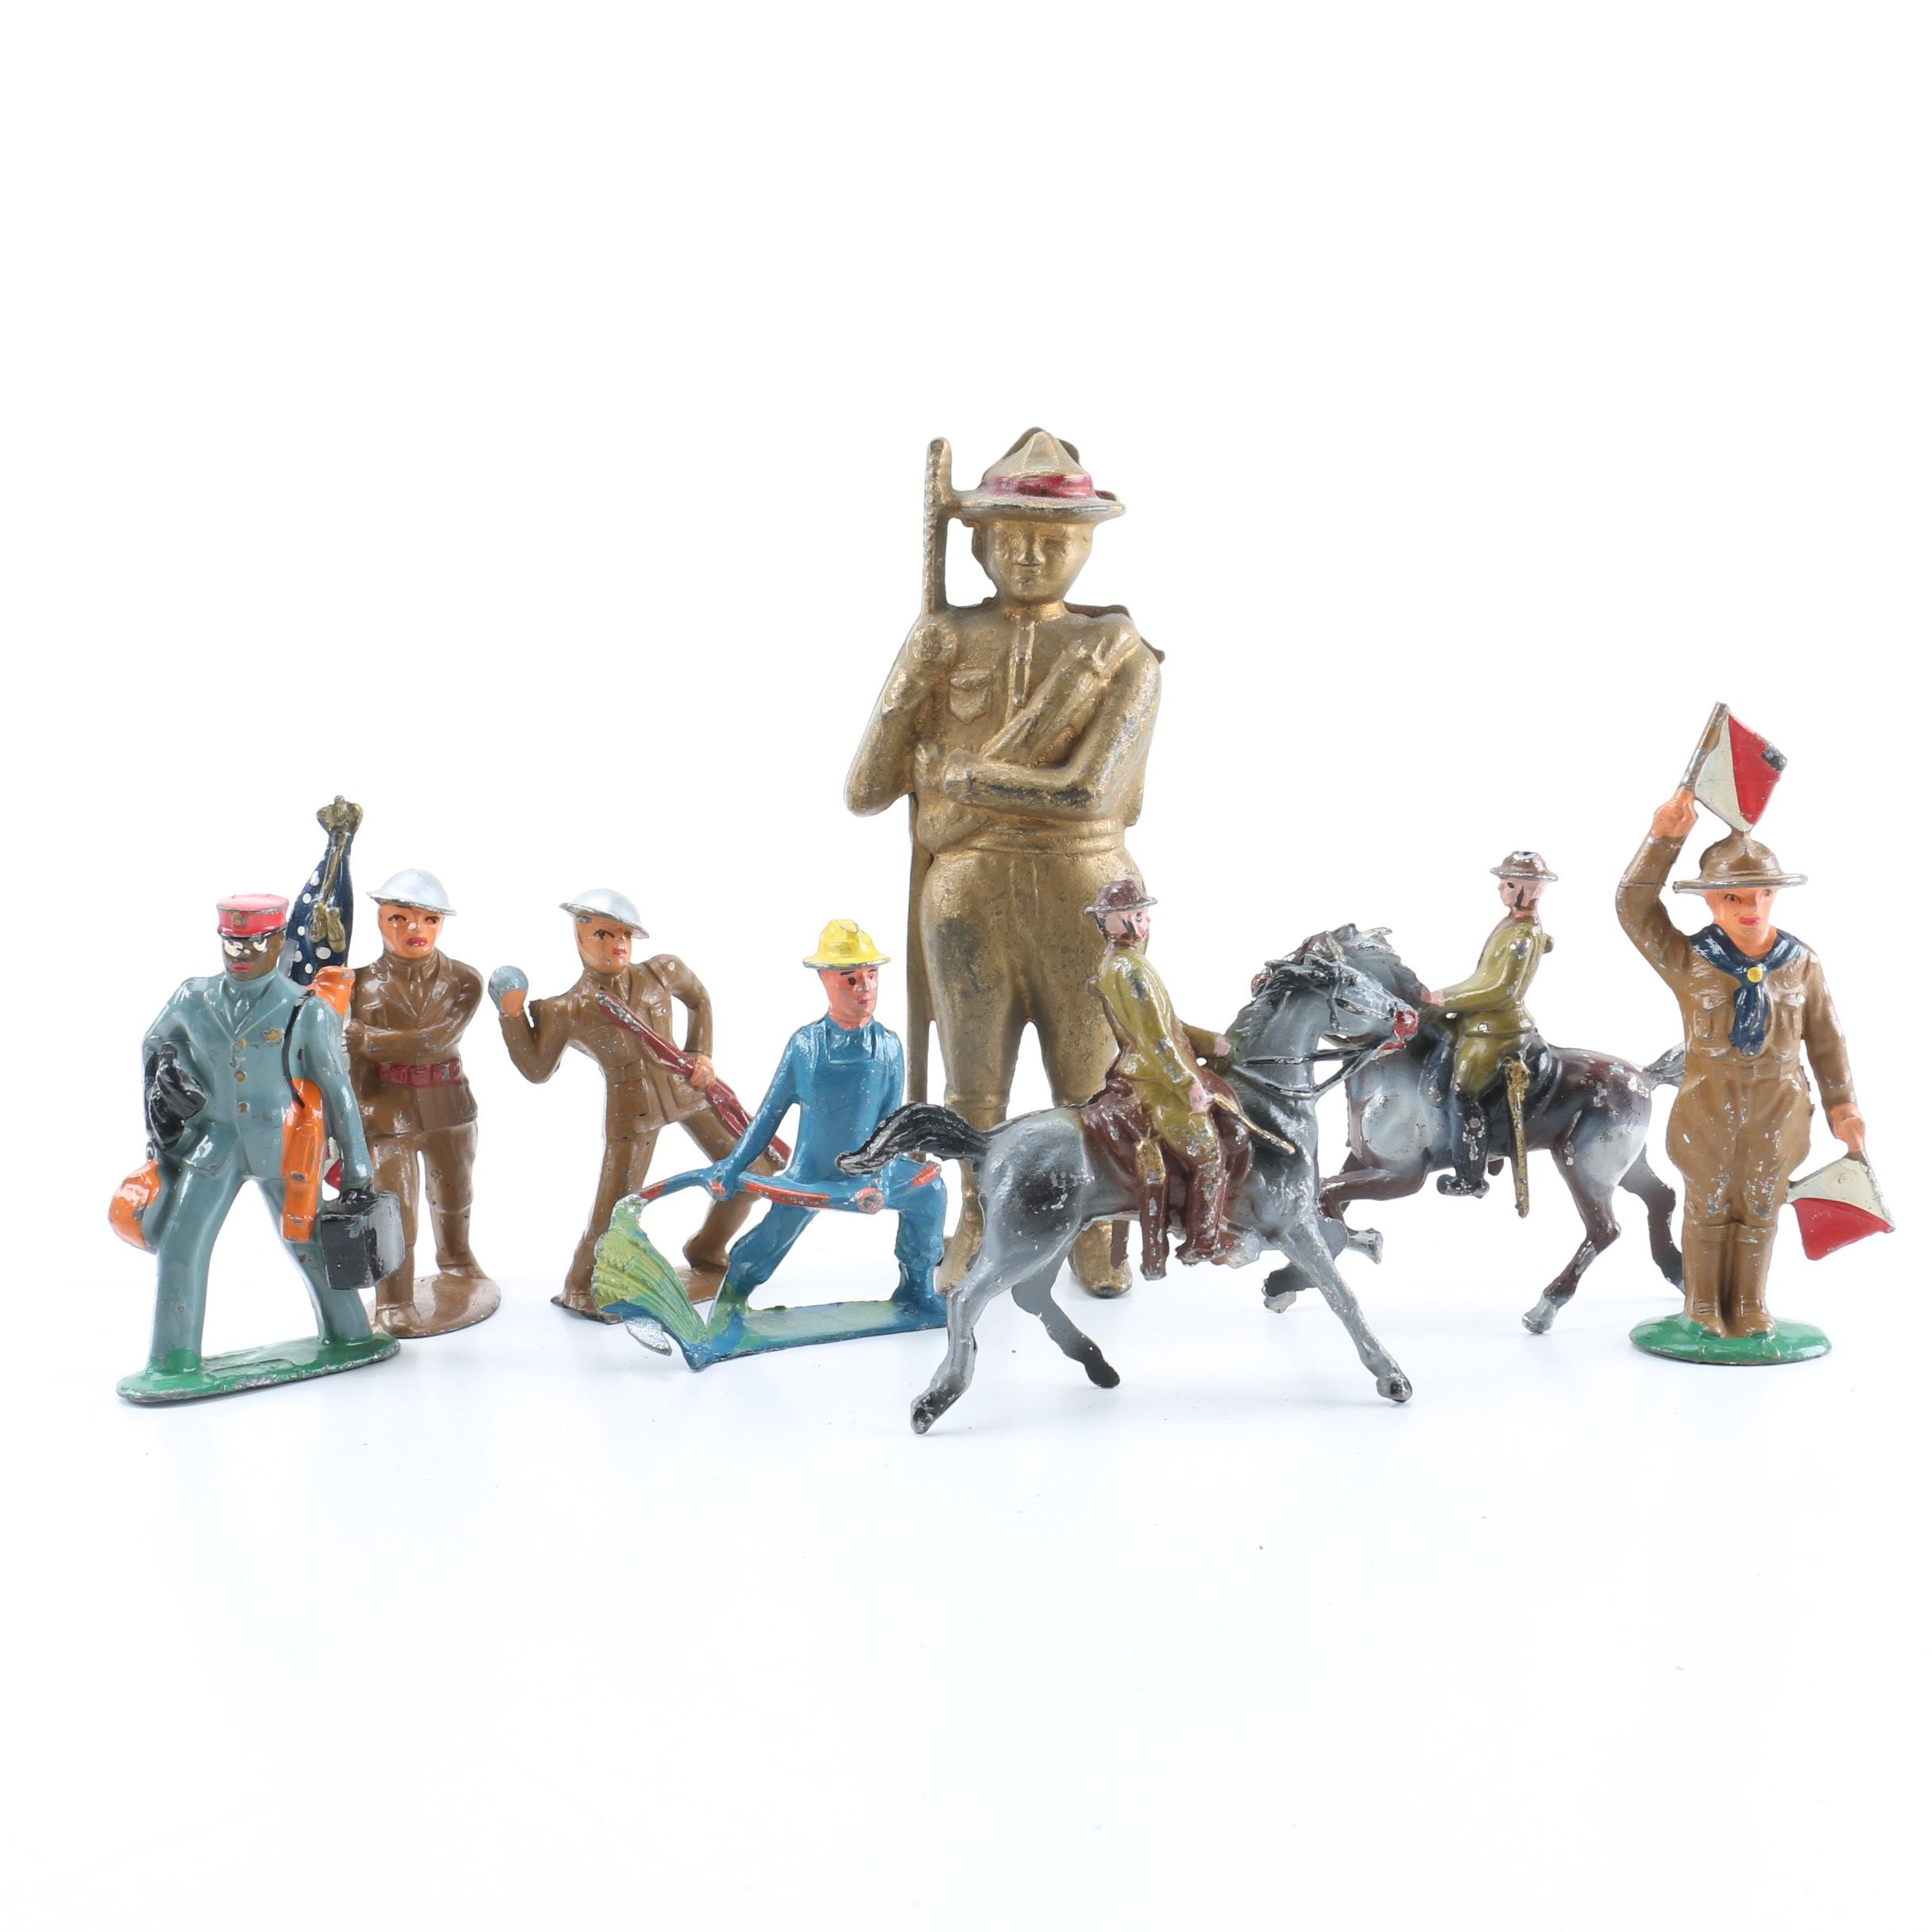 Assortment of Metal Toy Figurines